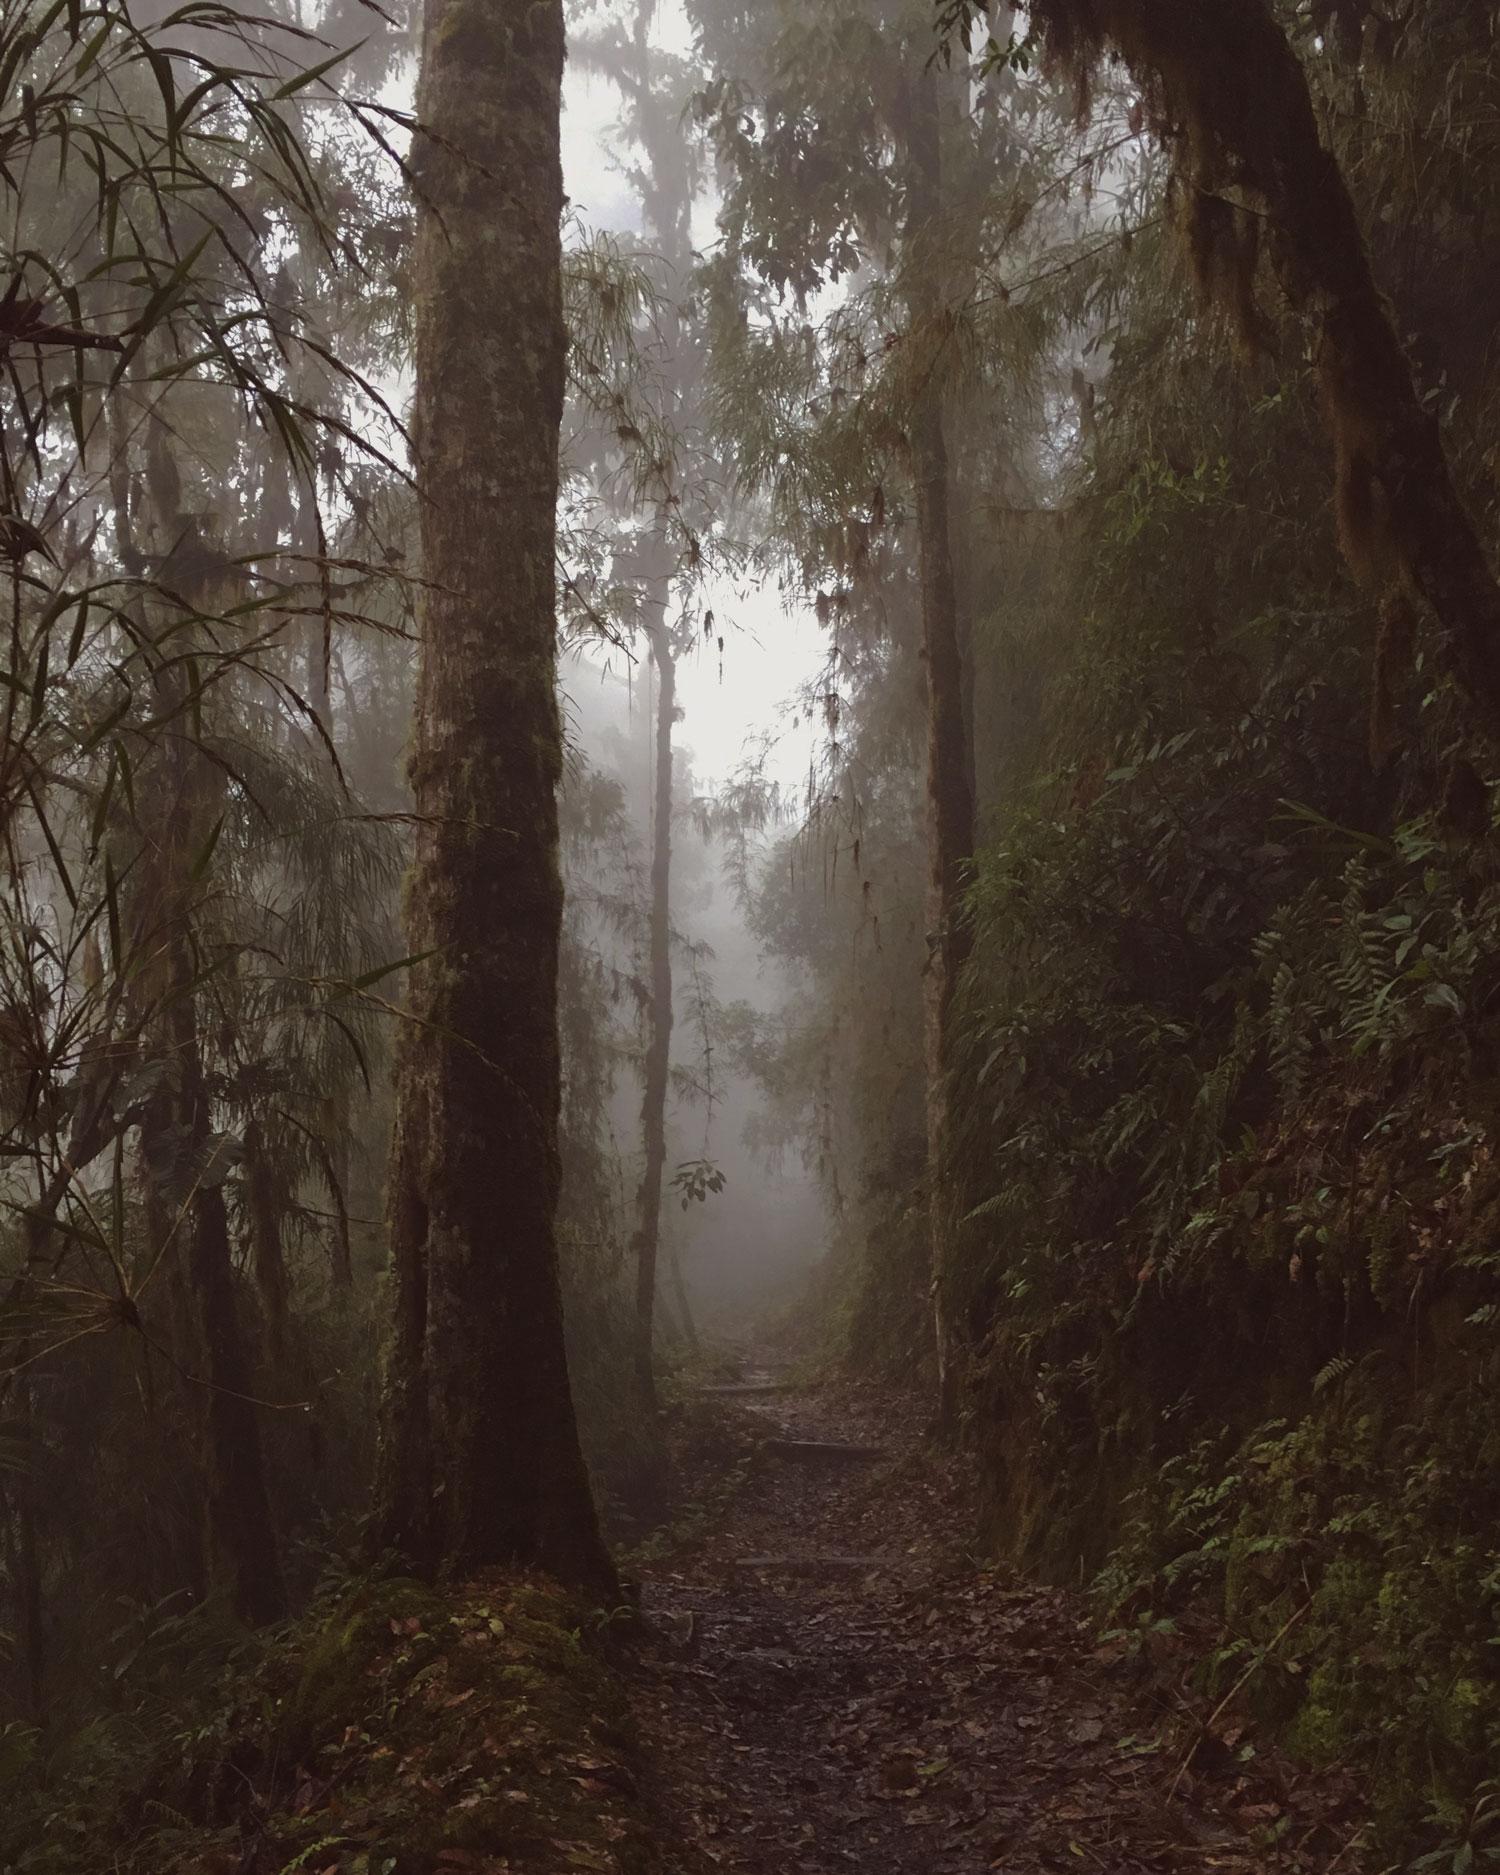 cerro-chiripo-costa-rica-wander-south-4.jpg